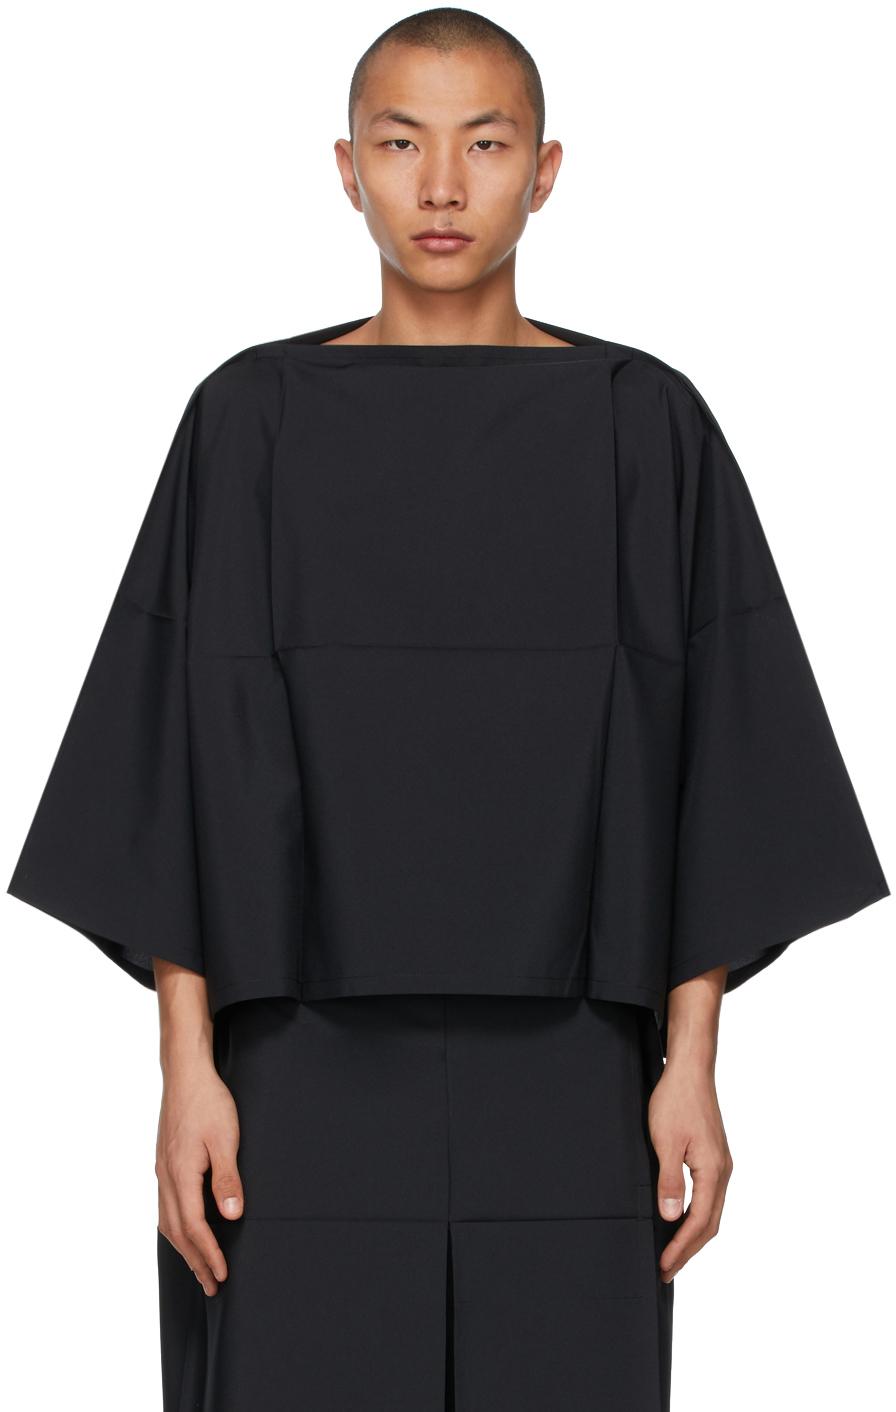 132 5 ISSEY MIYAKE Black Fold Square Sweater 211302M201023